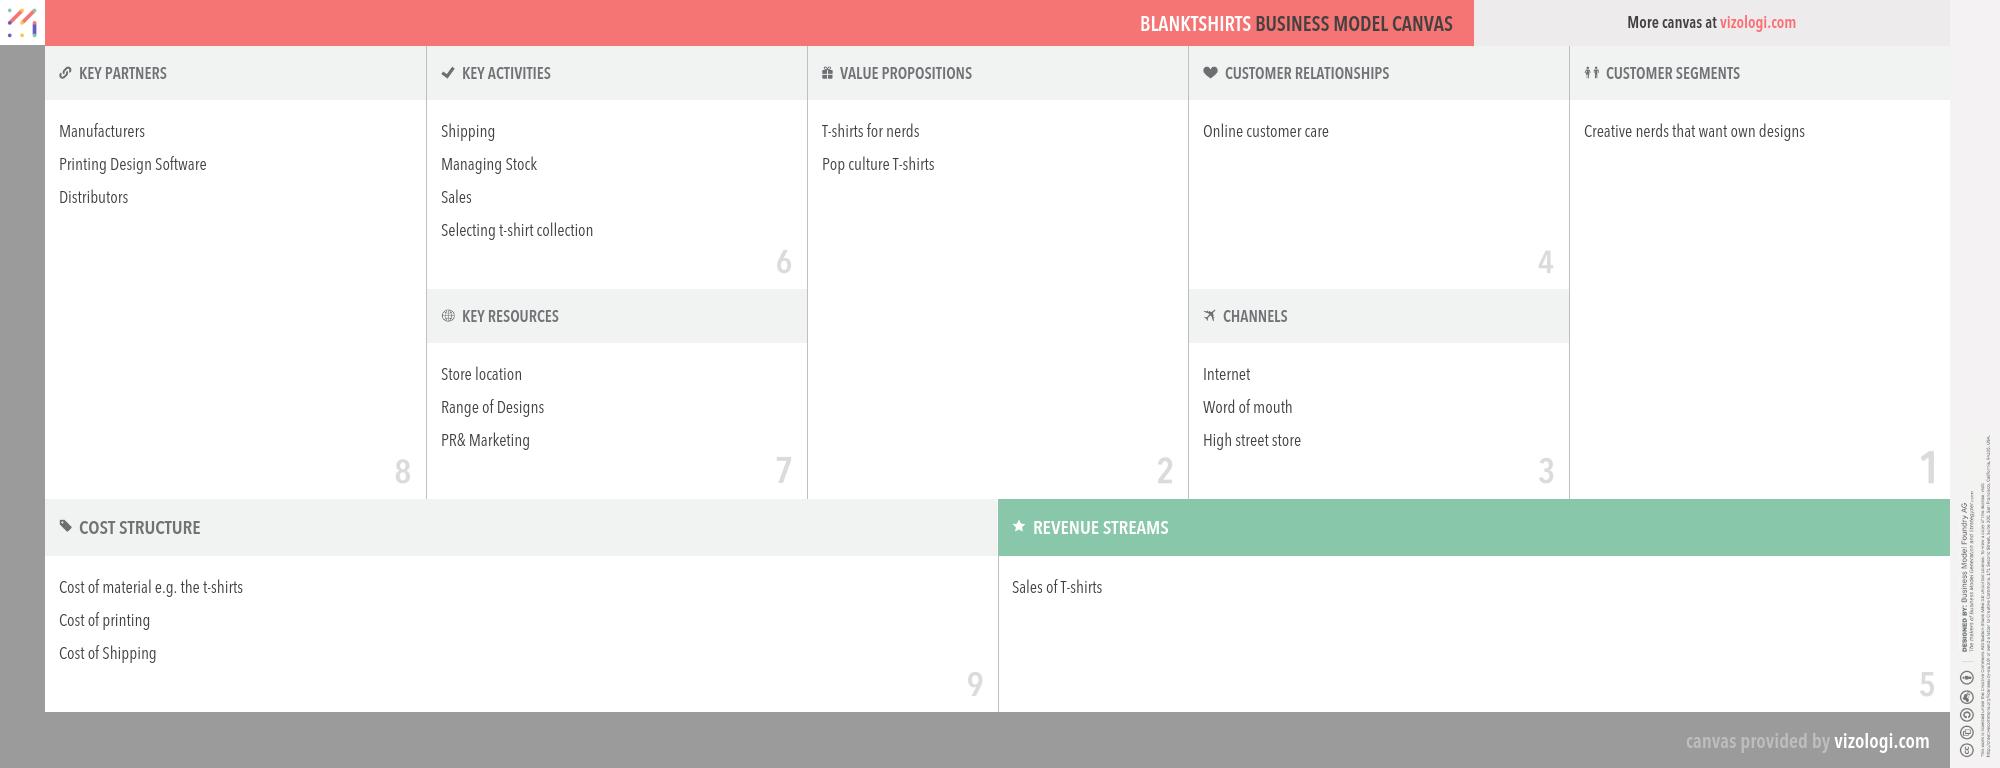 Blanktshirts business model canvas   Business Models